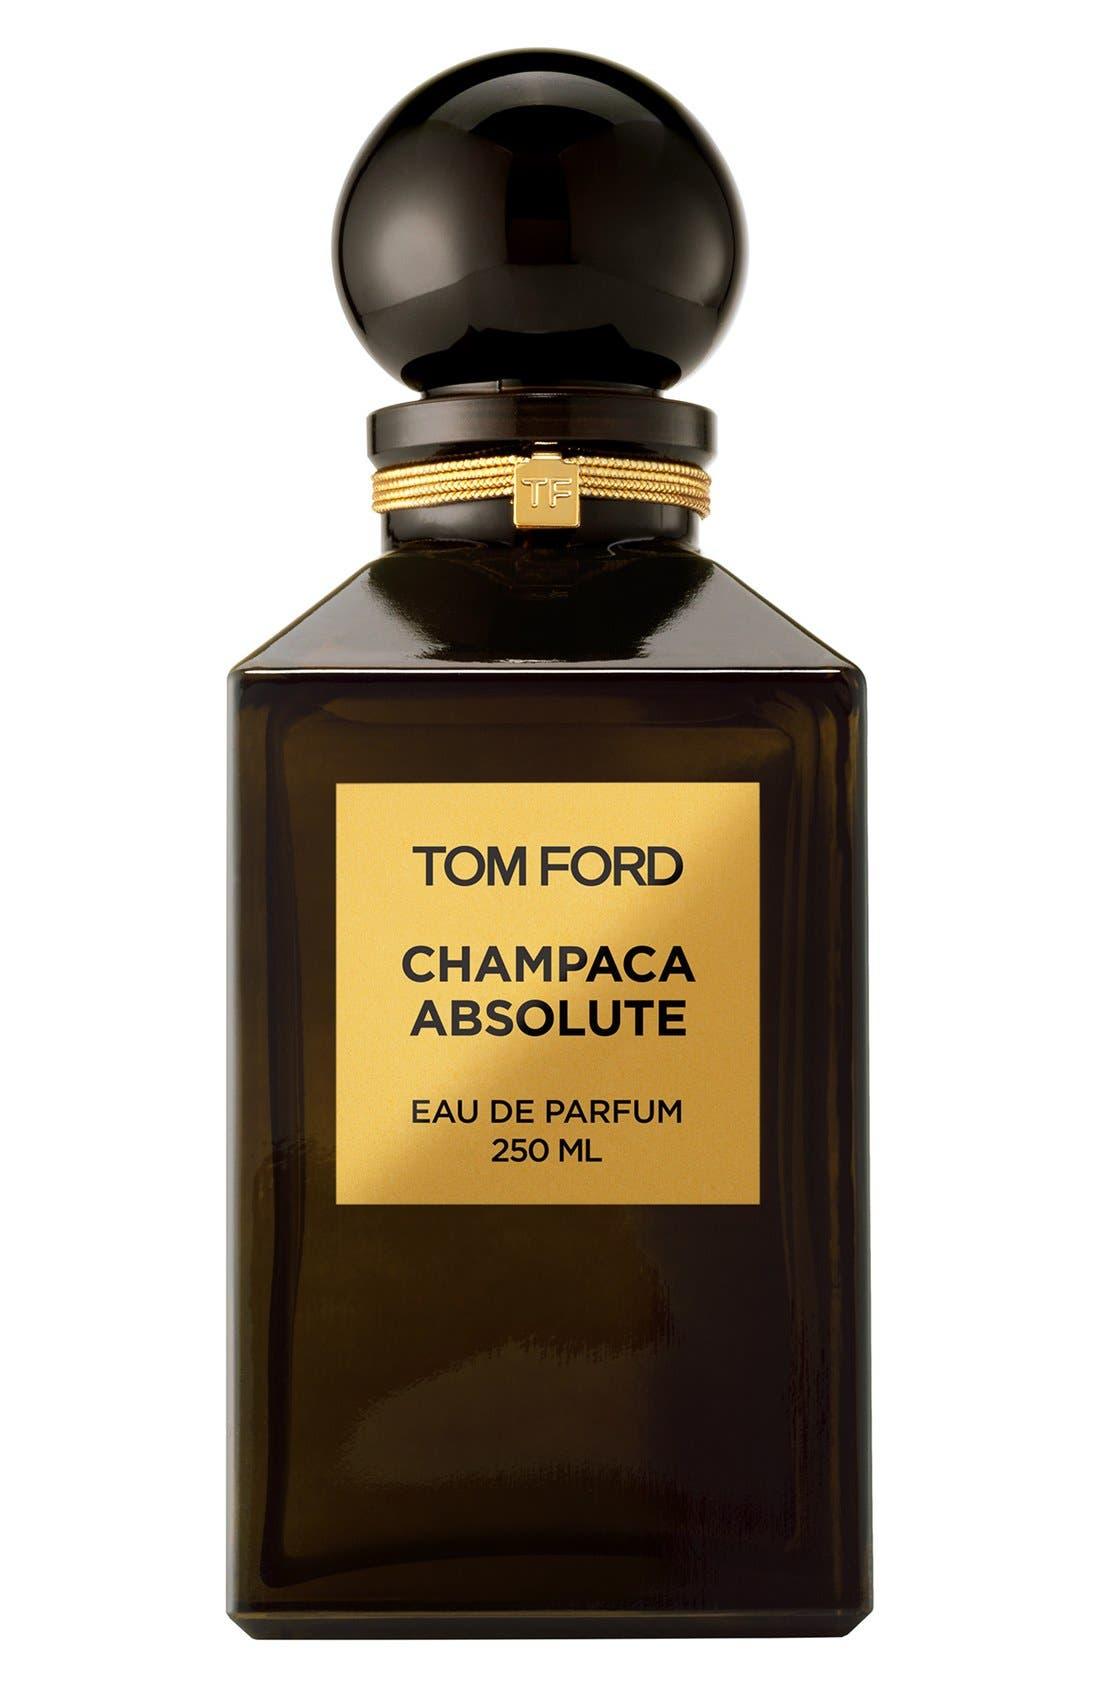 Tom Ford Private Blend Champaca Absolute Eau de Parfum Decanter